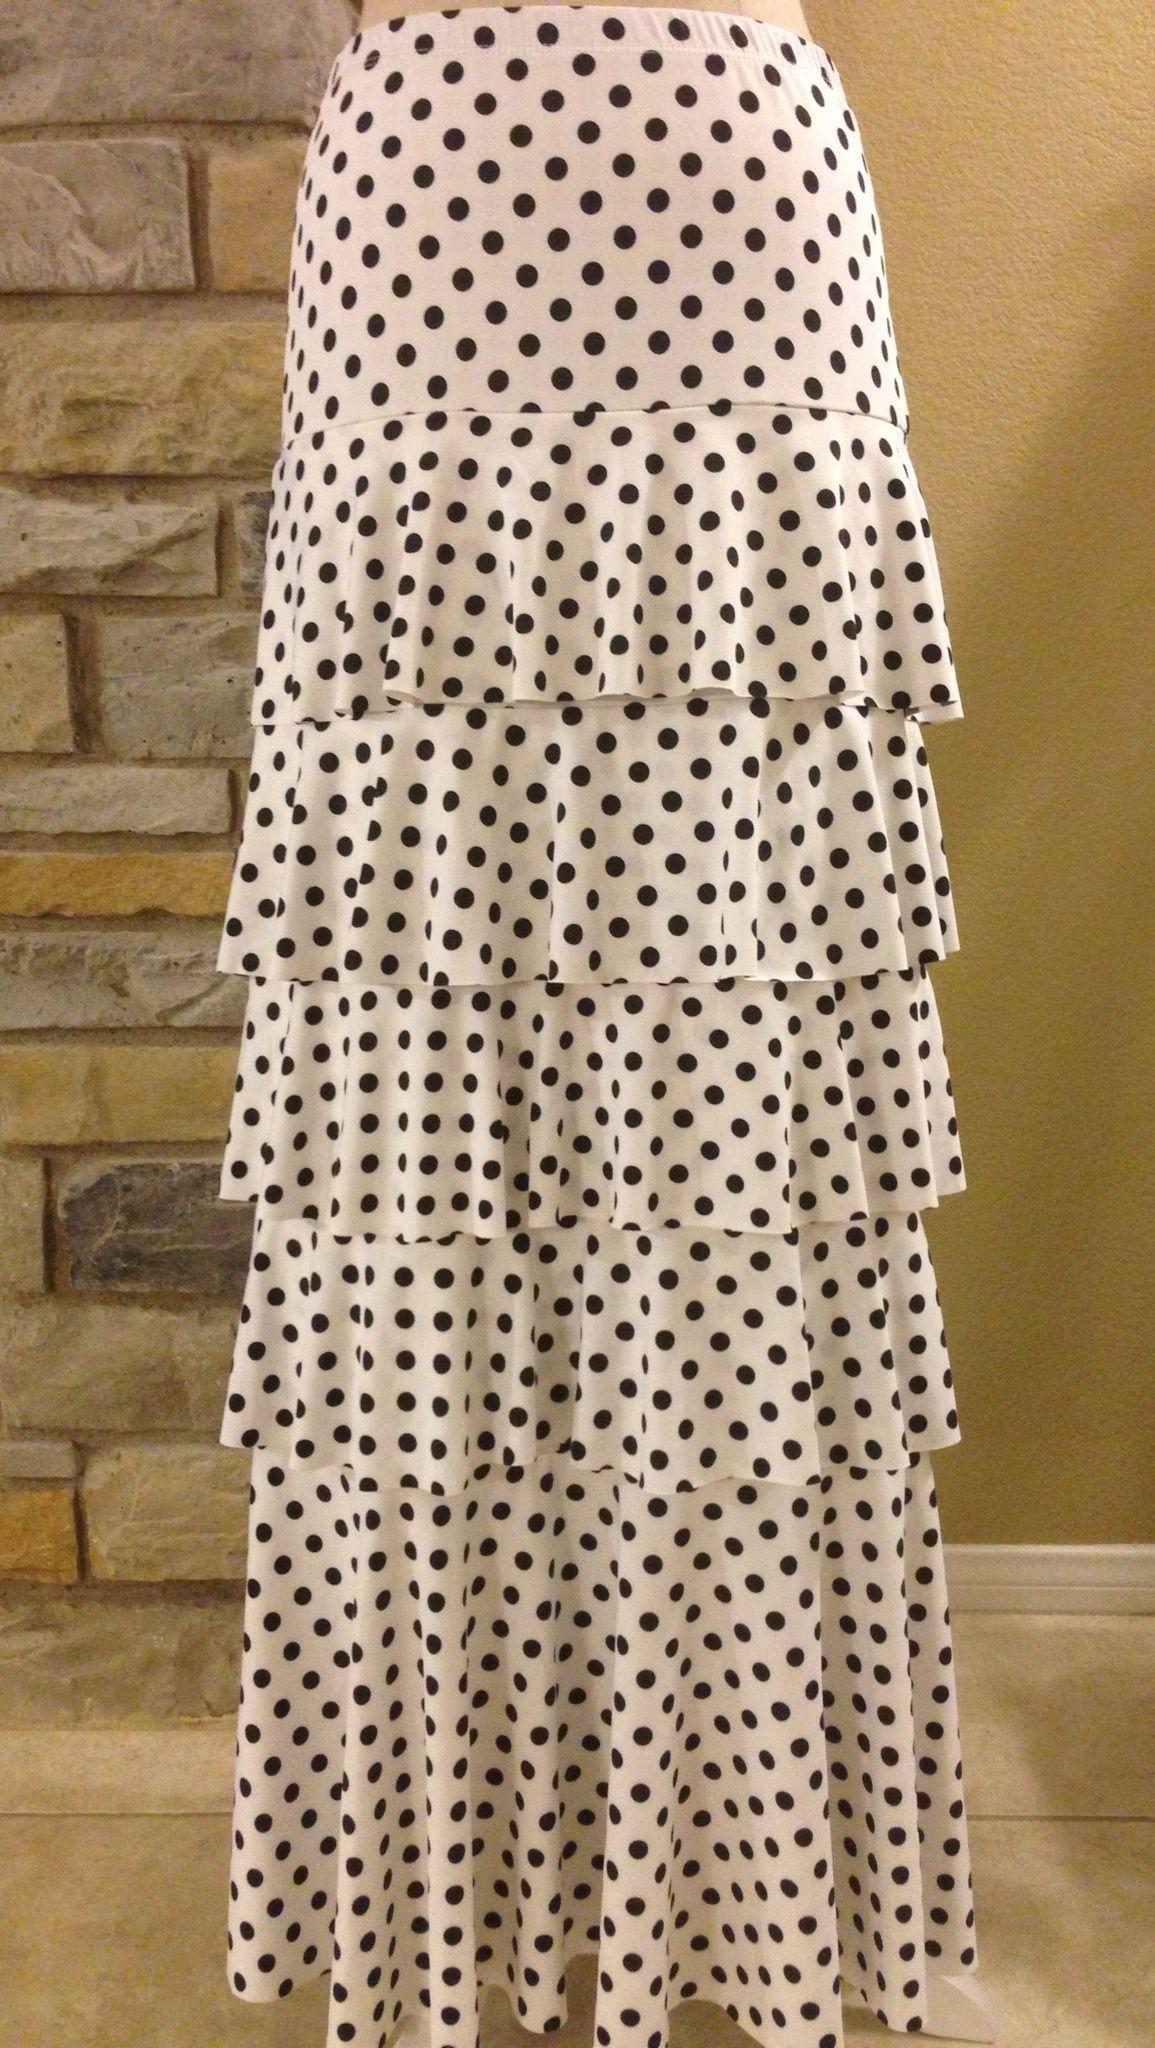 818d575e445d7 White & black polka dot ruffle layered skirt Shannasthreads.com Pin it to  win it!